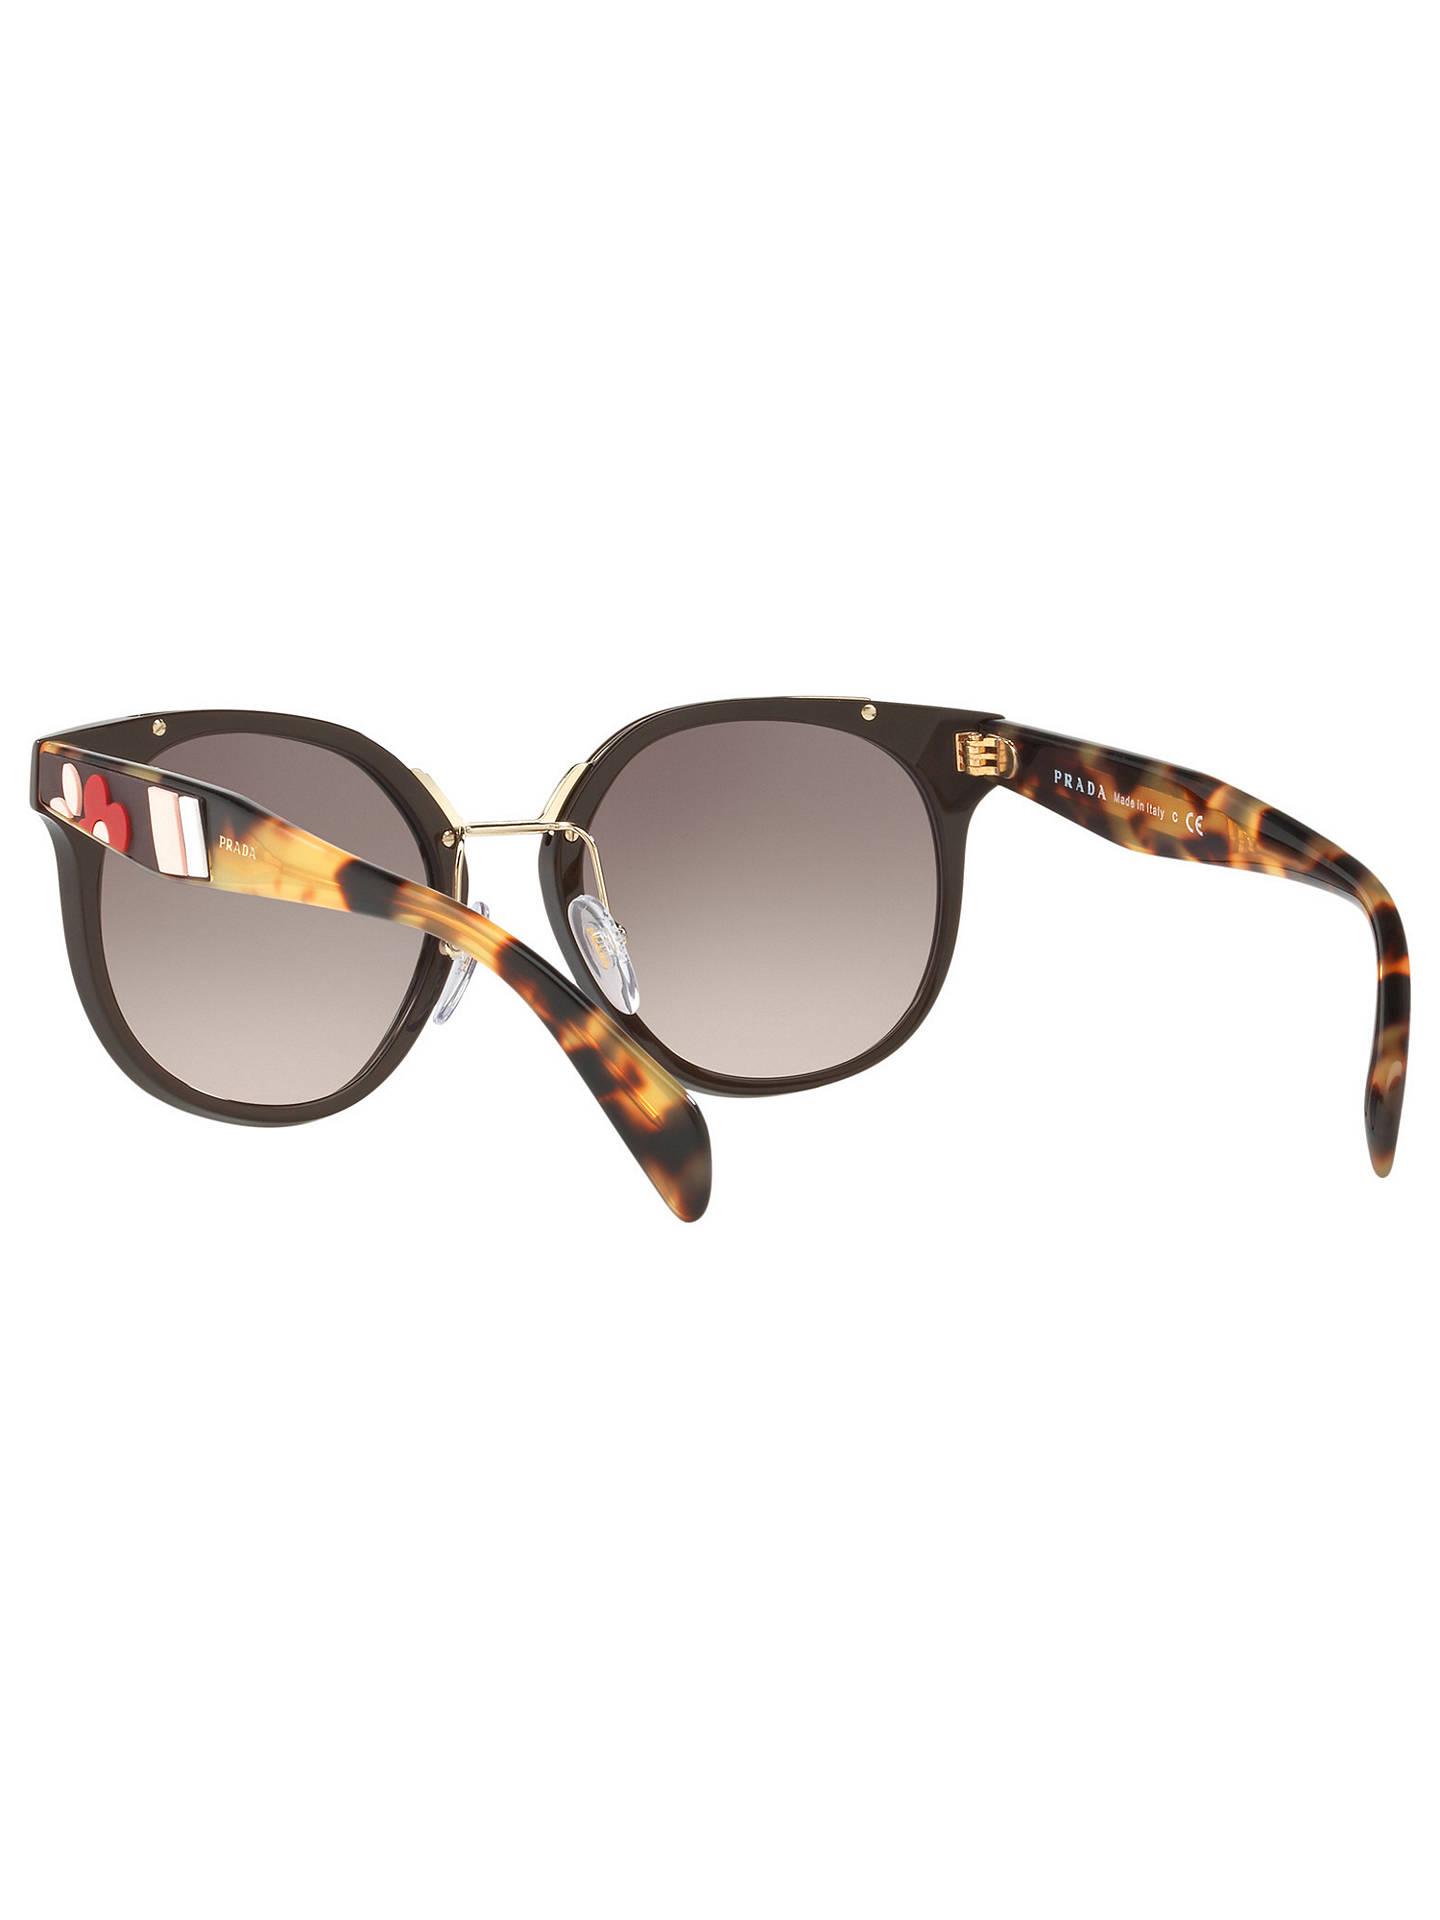 ea0c762b56b ... shop buyprada pr 17ts womens square sunglasses brown pink gradient  online at johnlewis. 2863c 448c8 get prada ...